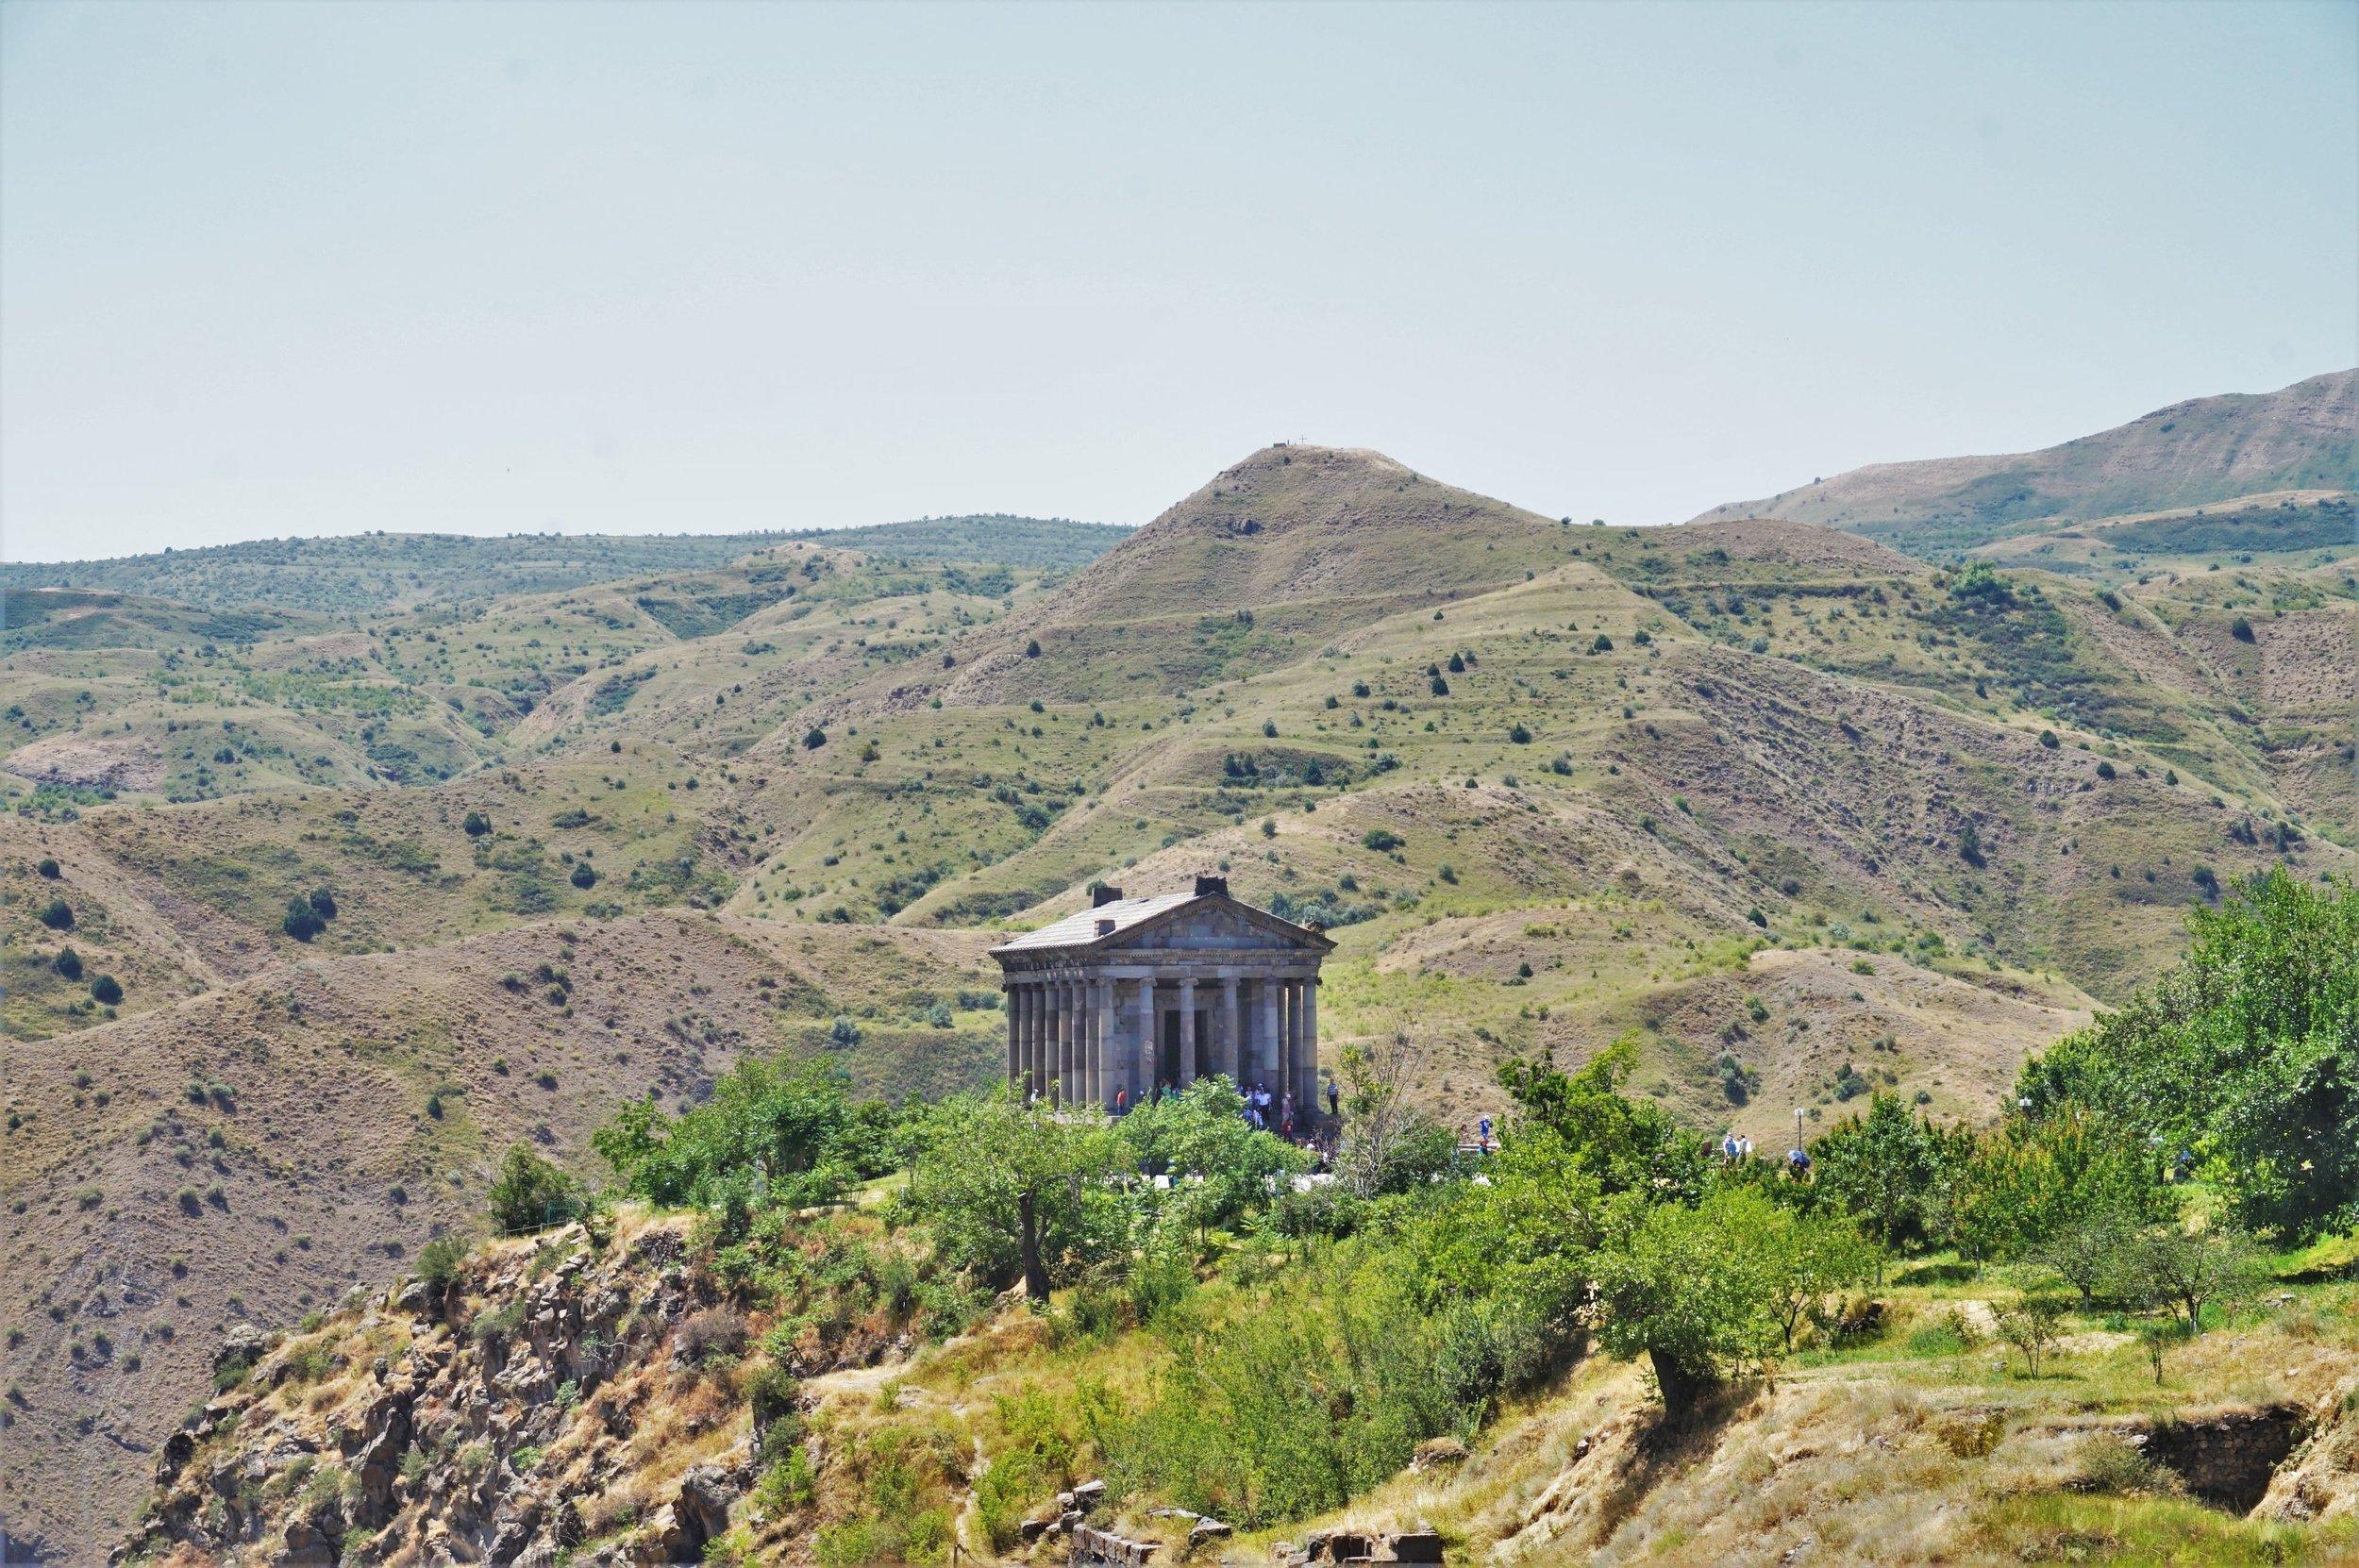 Visit the Garni Temple near Yerevan, Armenia.